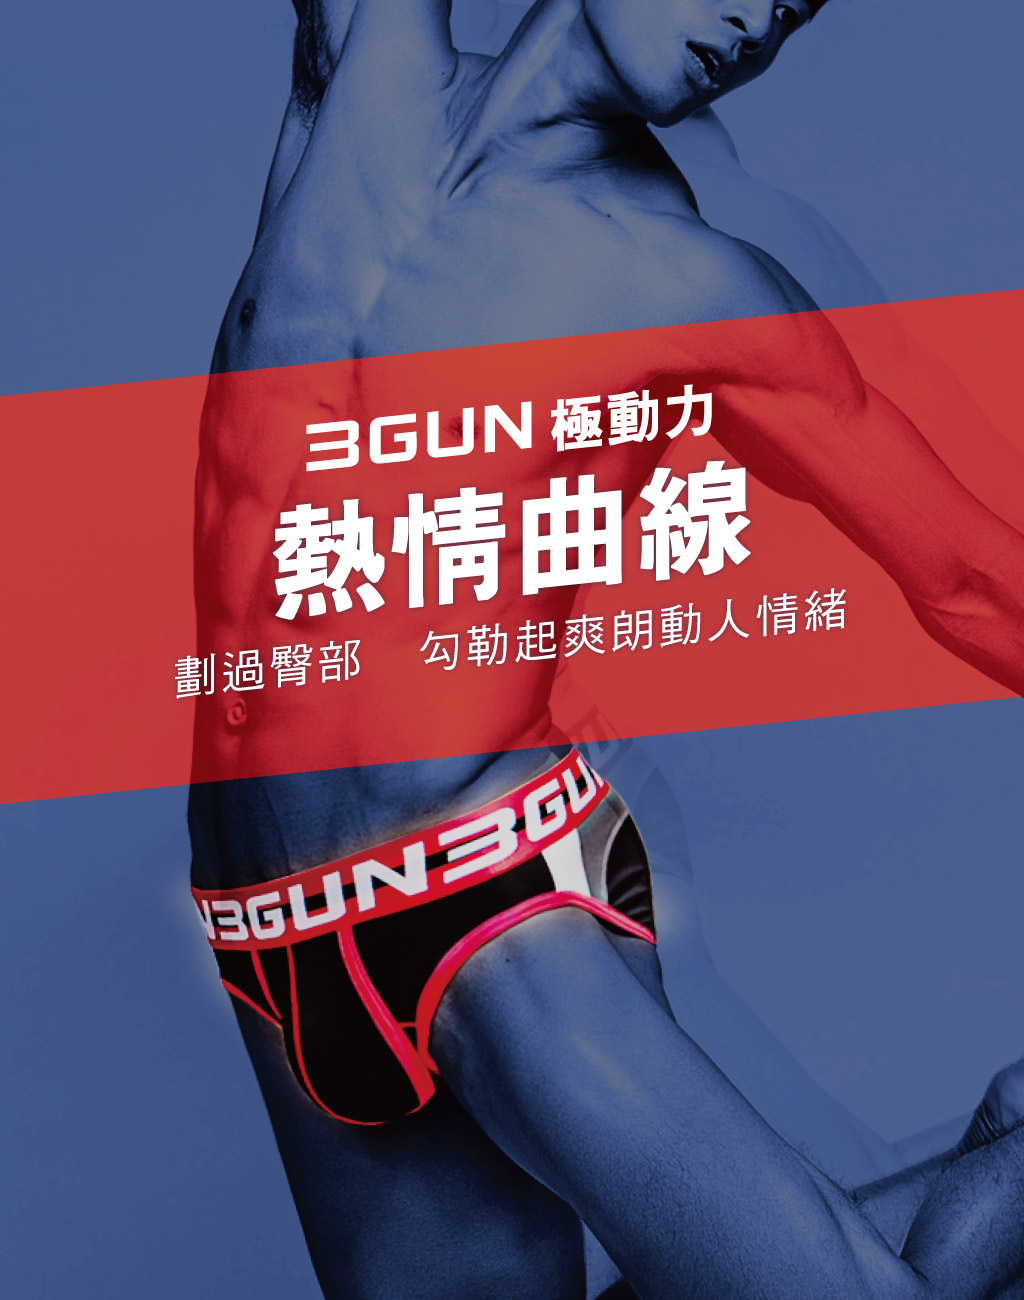 3GUN |男性時尚內衣褲MIT品牌-炫色動感-勾臀網眼男真快乾平口褲